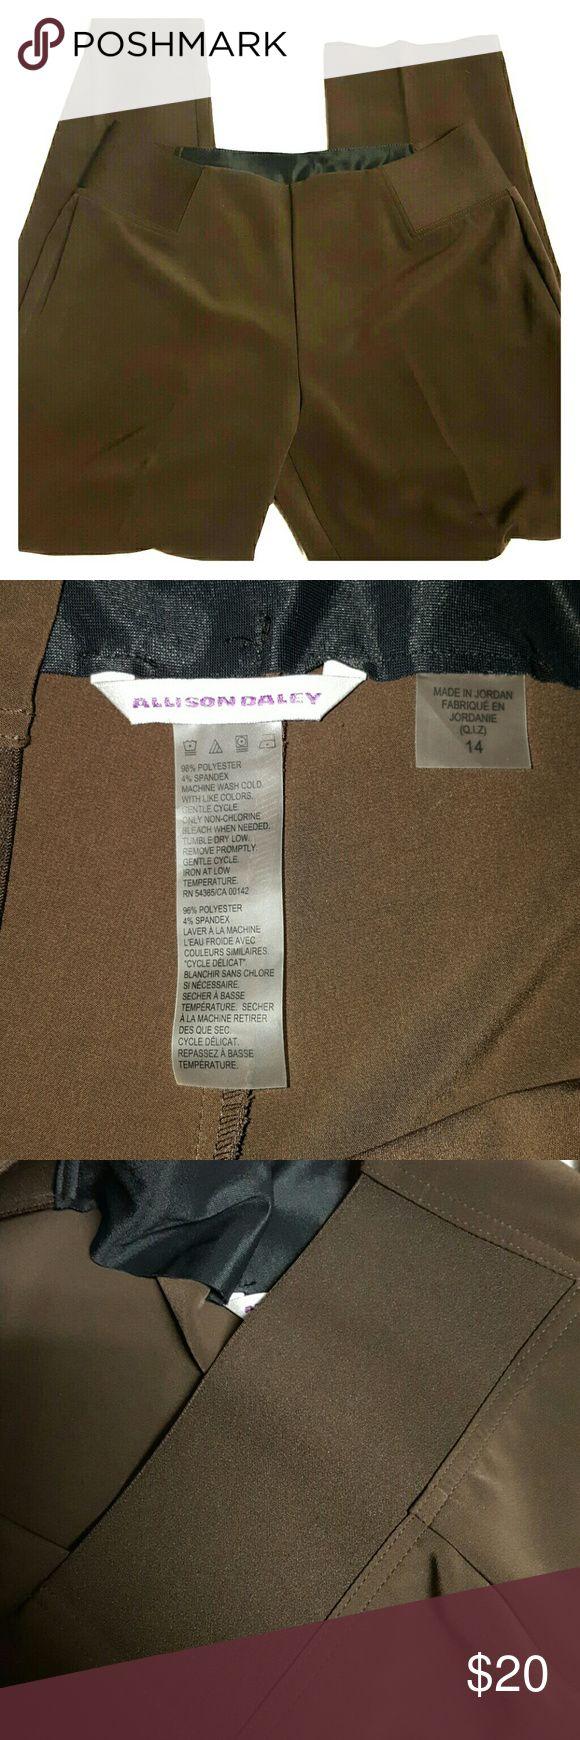 "Allison Daley brown slacks Elastic on waist polyester spandex blend 32"" inseam Brown Allison daley  Pants"